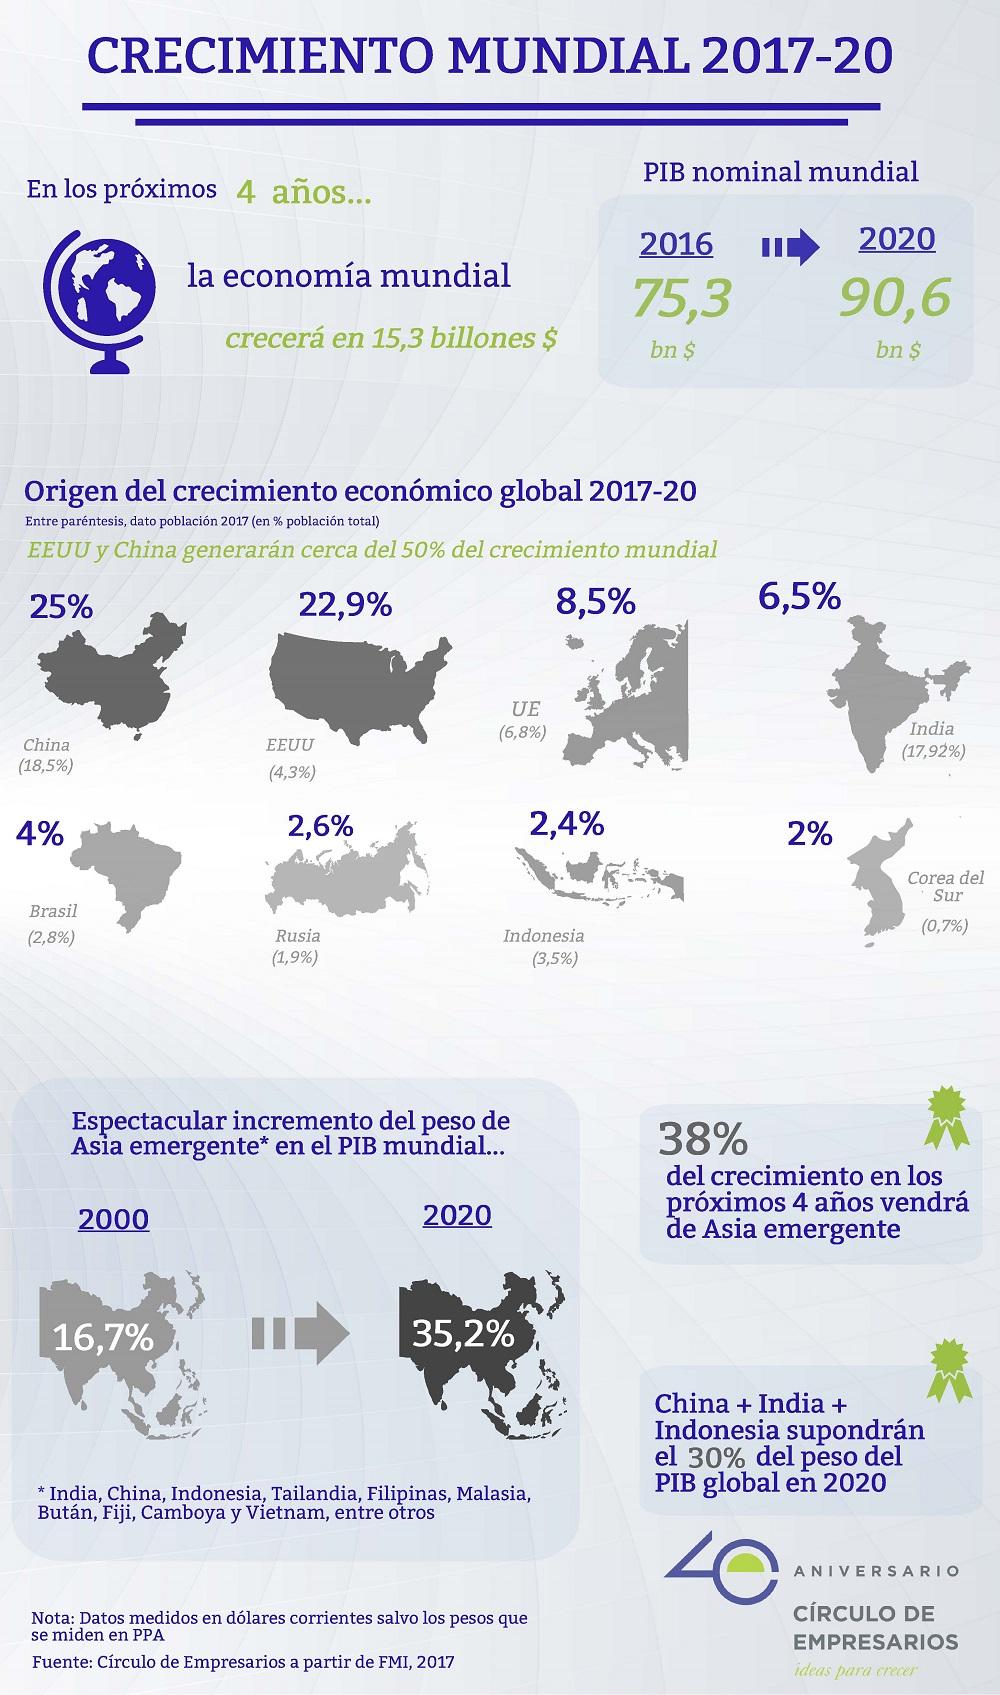 Crecimiento-mundial-2017-20